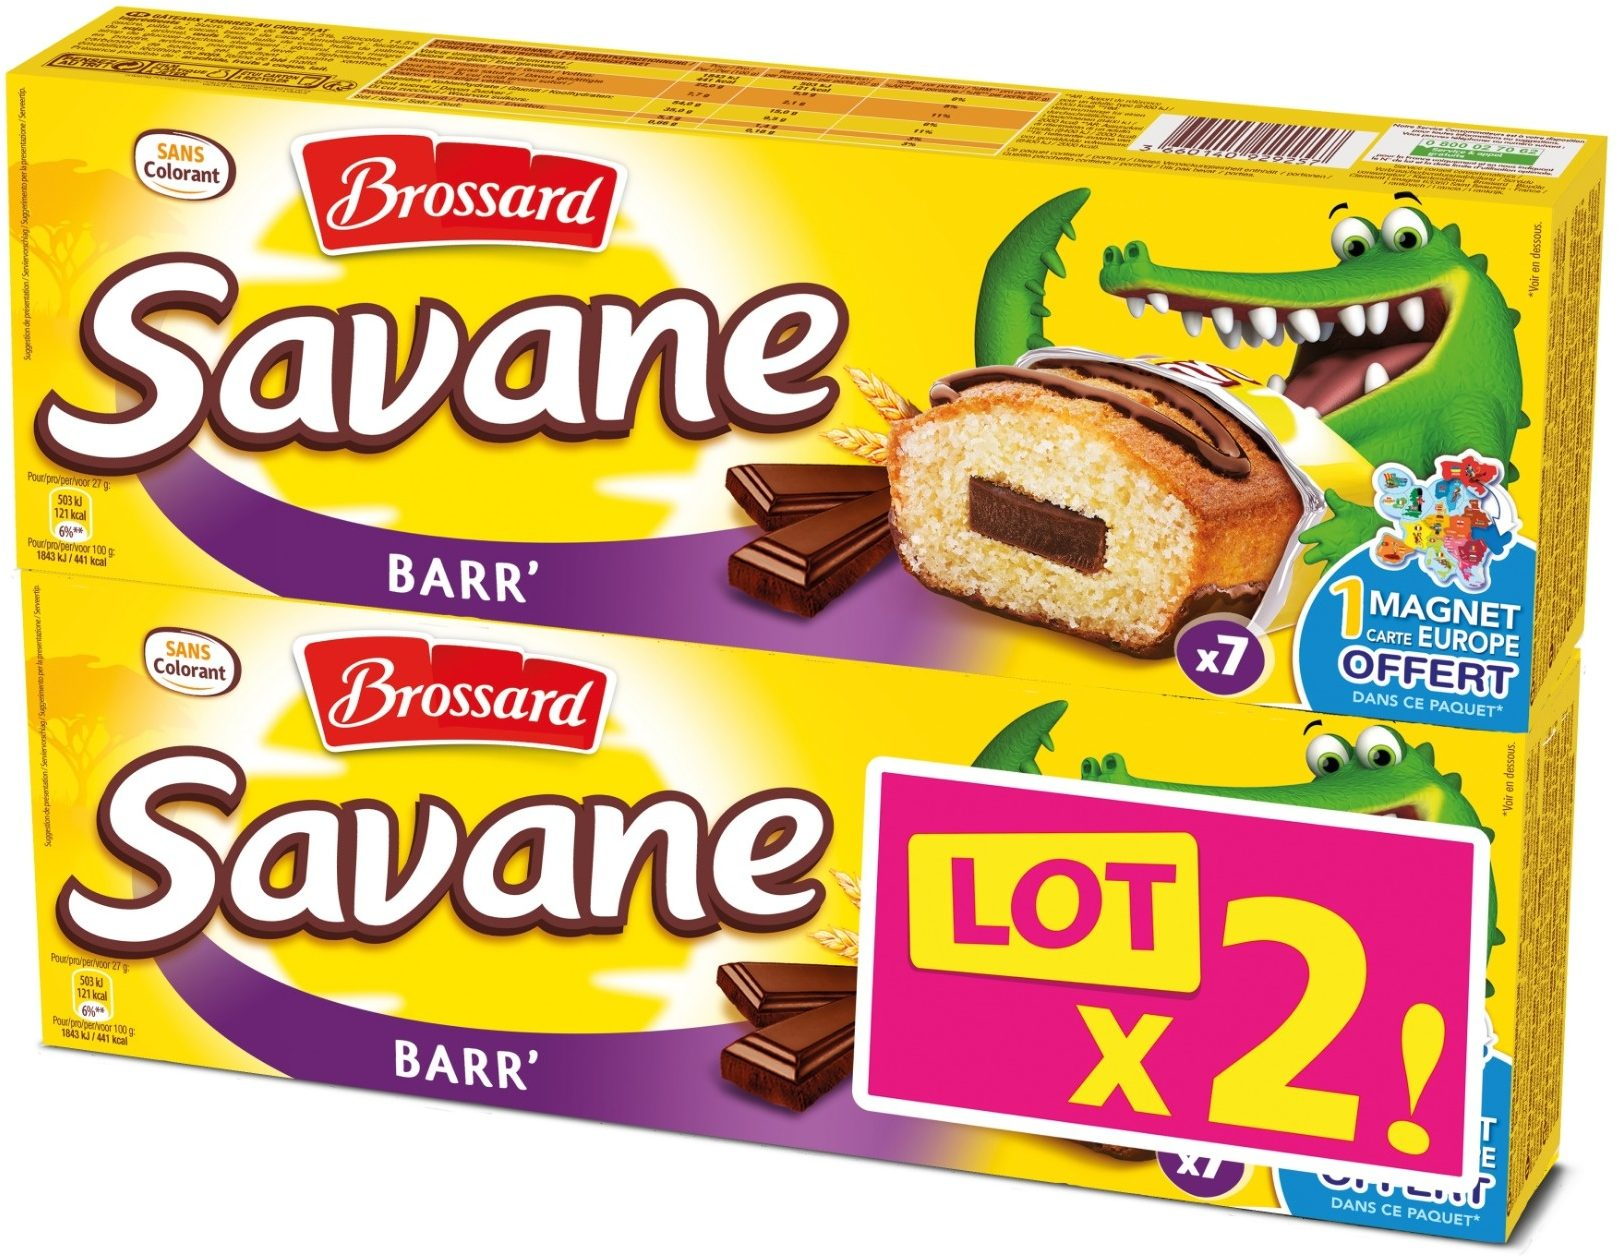 Mini Savane chocolat pocket barre, Brossard LOT DE 2 (14 x 27 g)